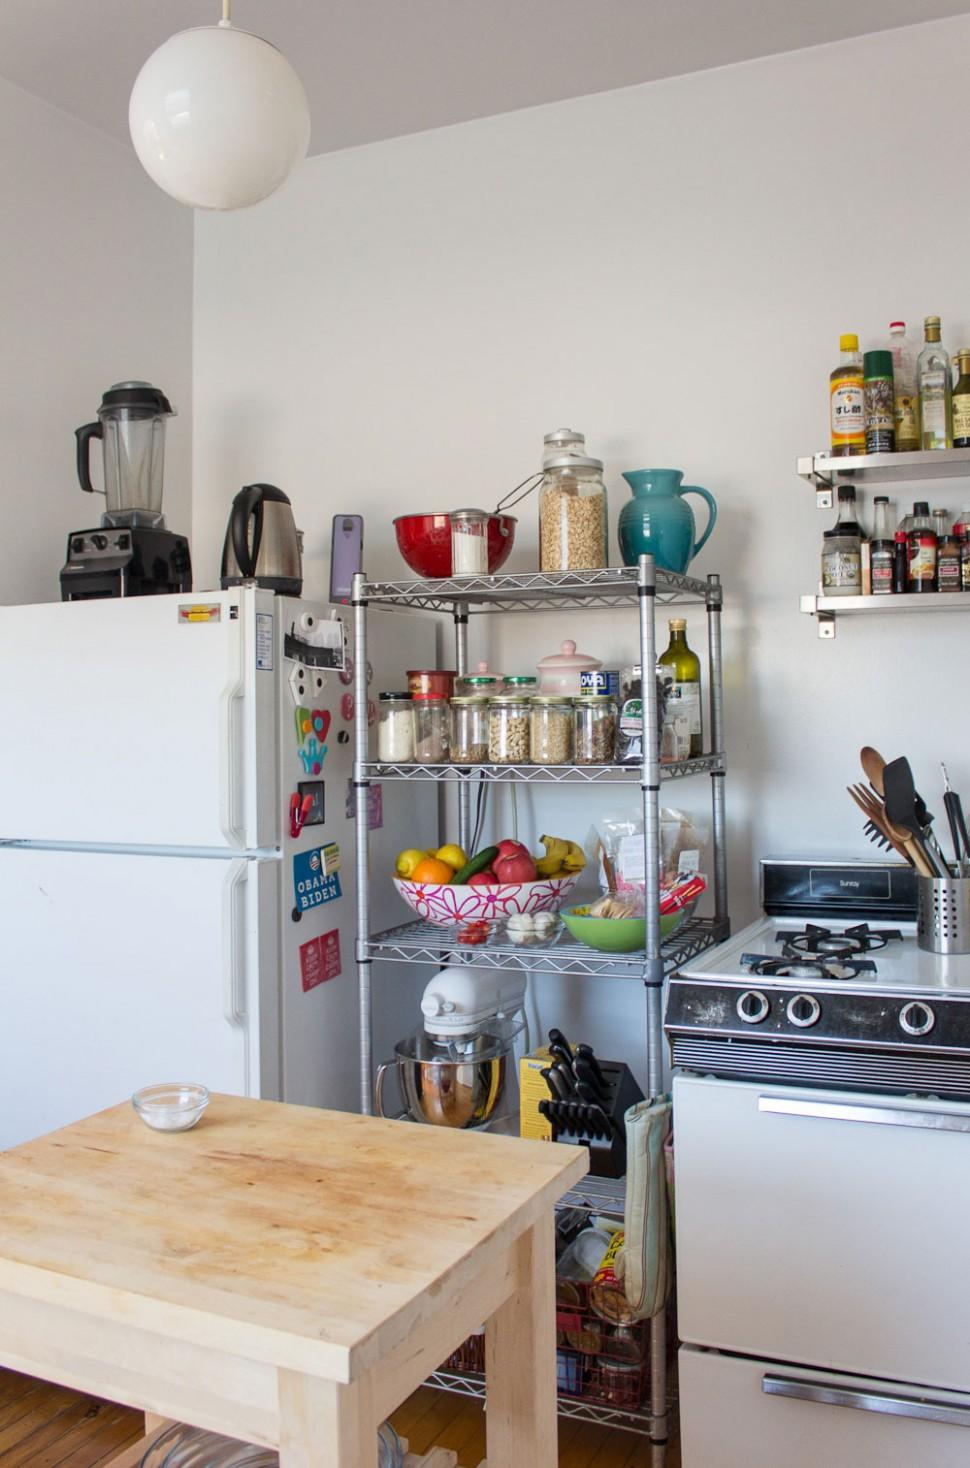 8+ Best Small Kitchen Design Ideas - Decorating Tiny Apartment  - Small Apartment Kitchen Decor Ideas